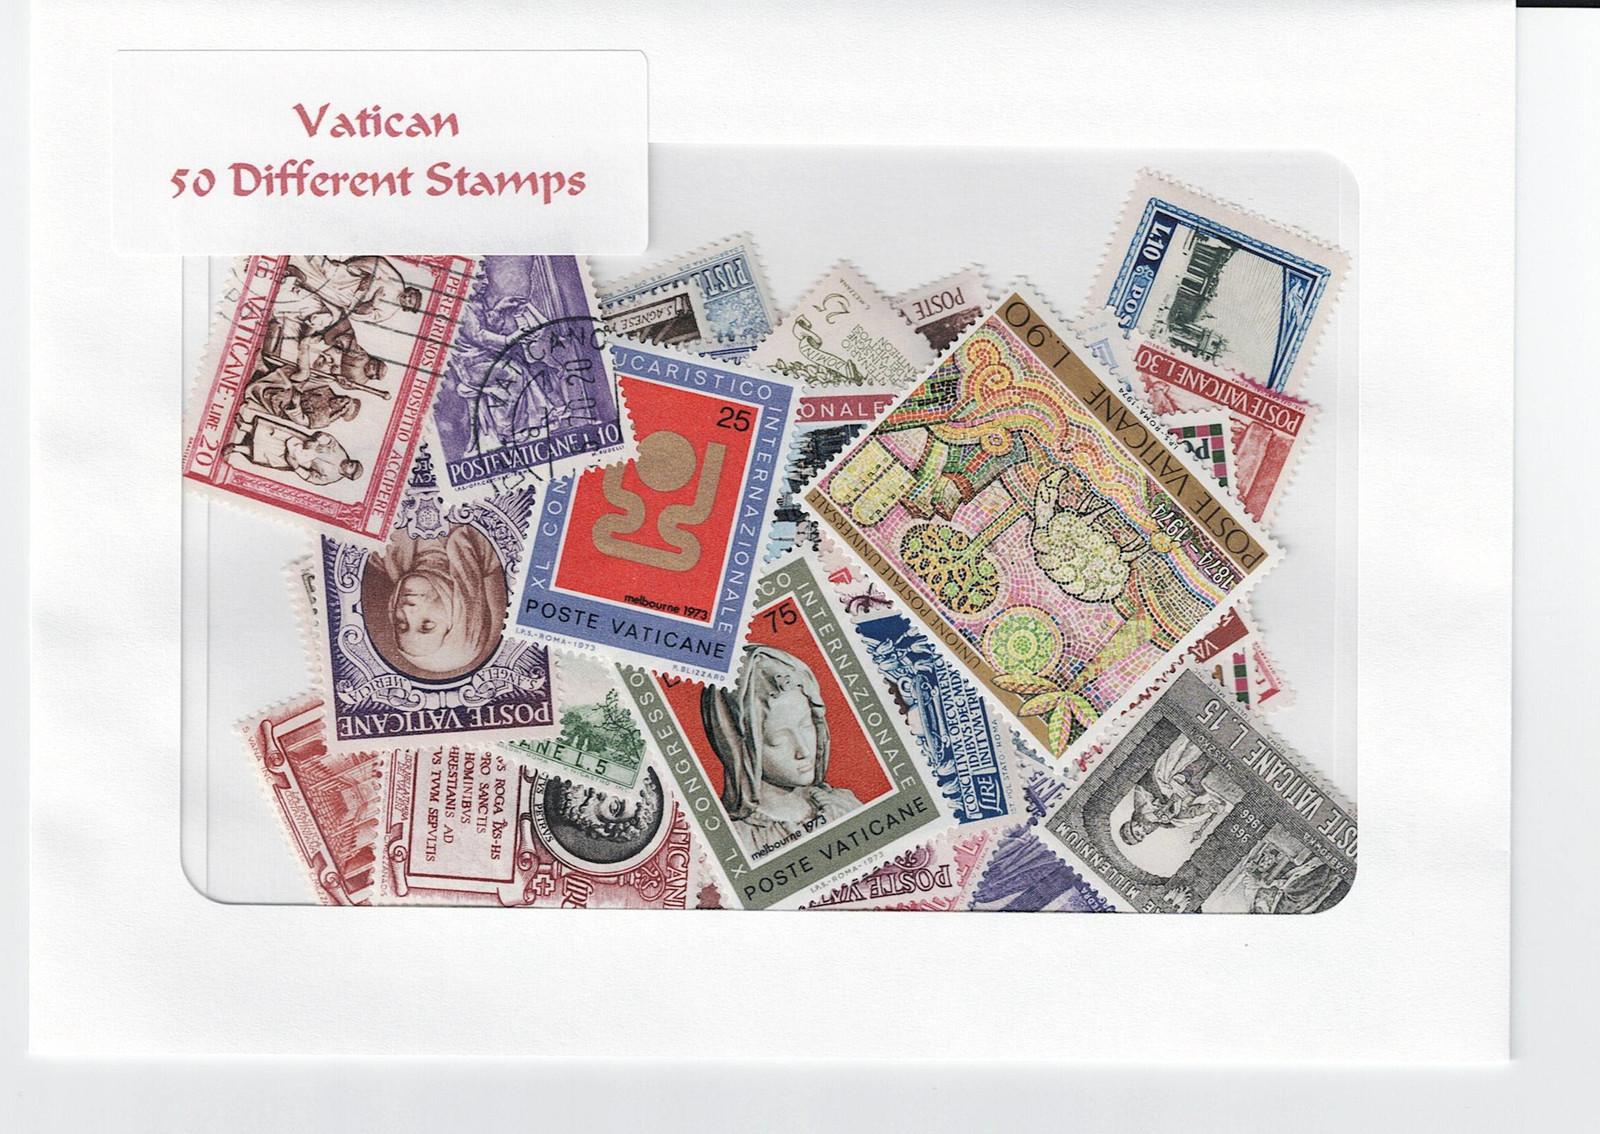 Vatican50different